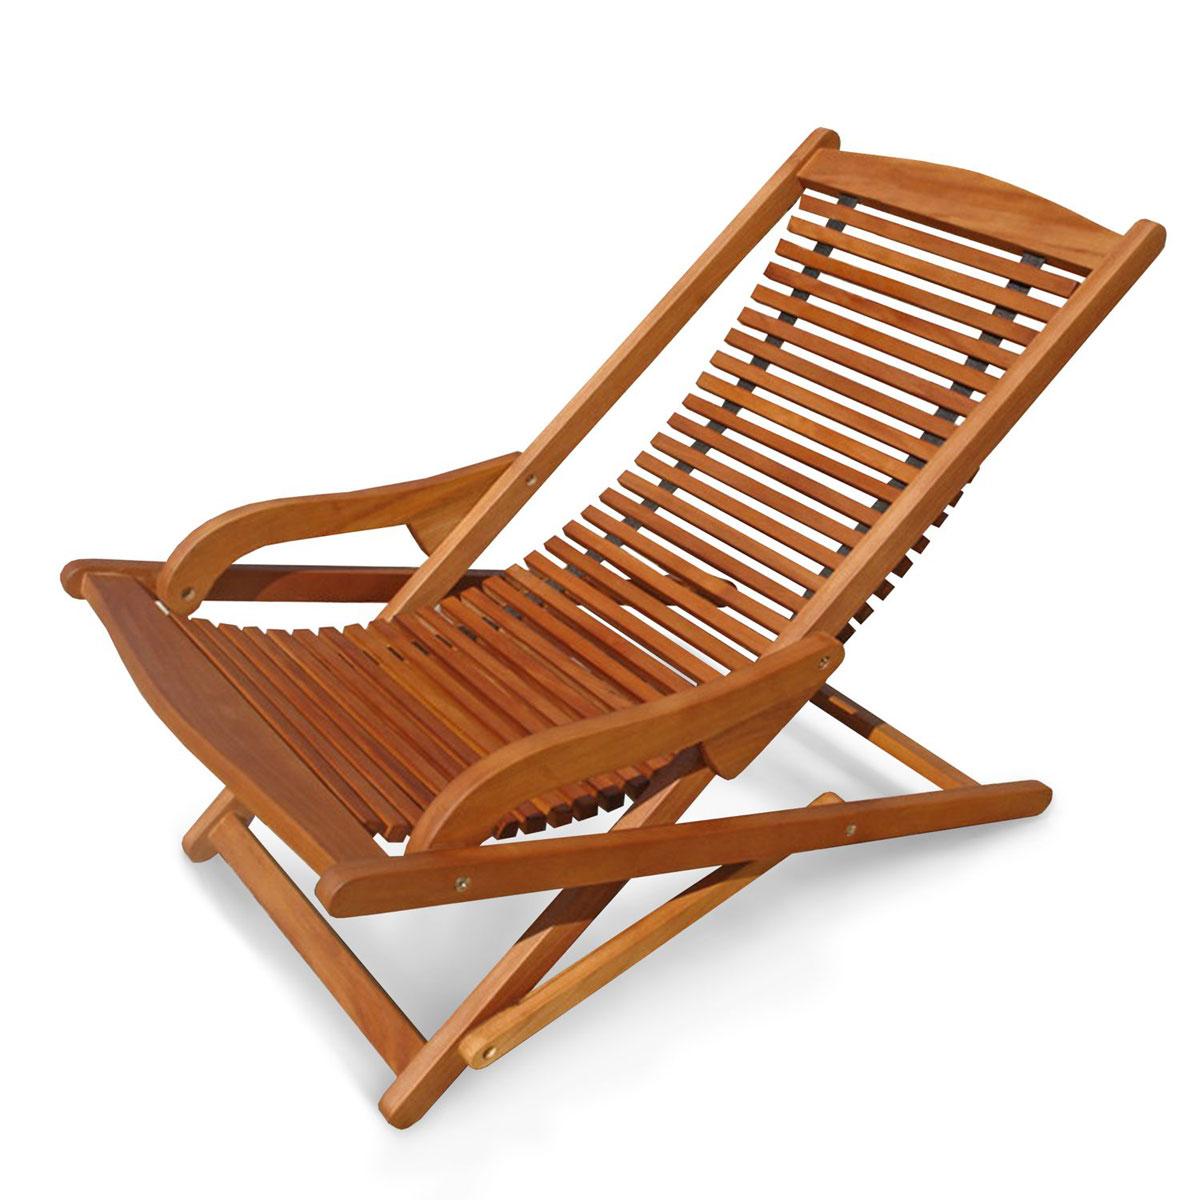 "Bänke und Liegen - Relax Chair ""Sun Flair""  - Onlineshop Hellweg"